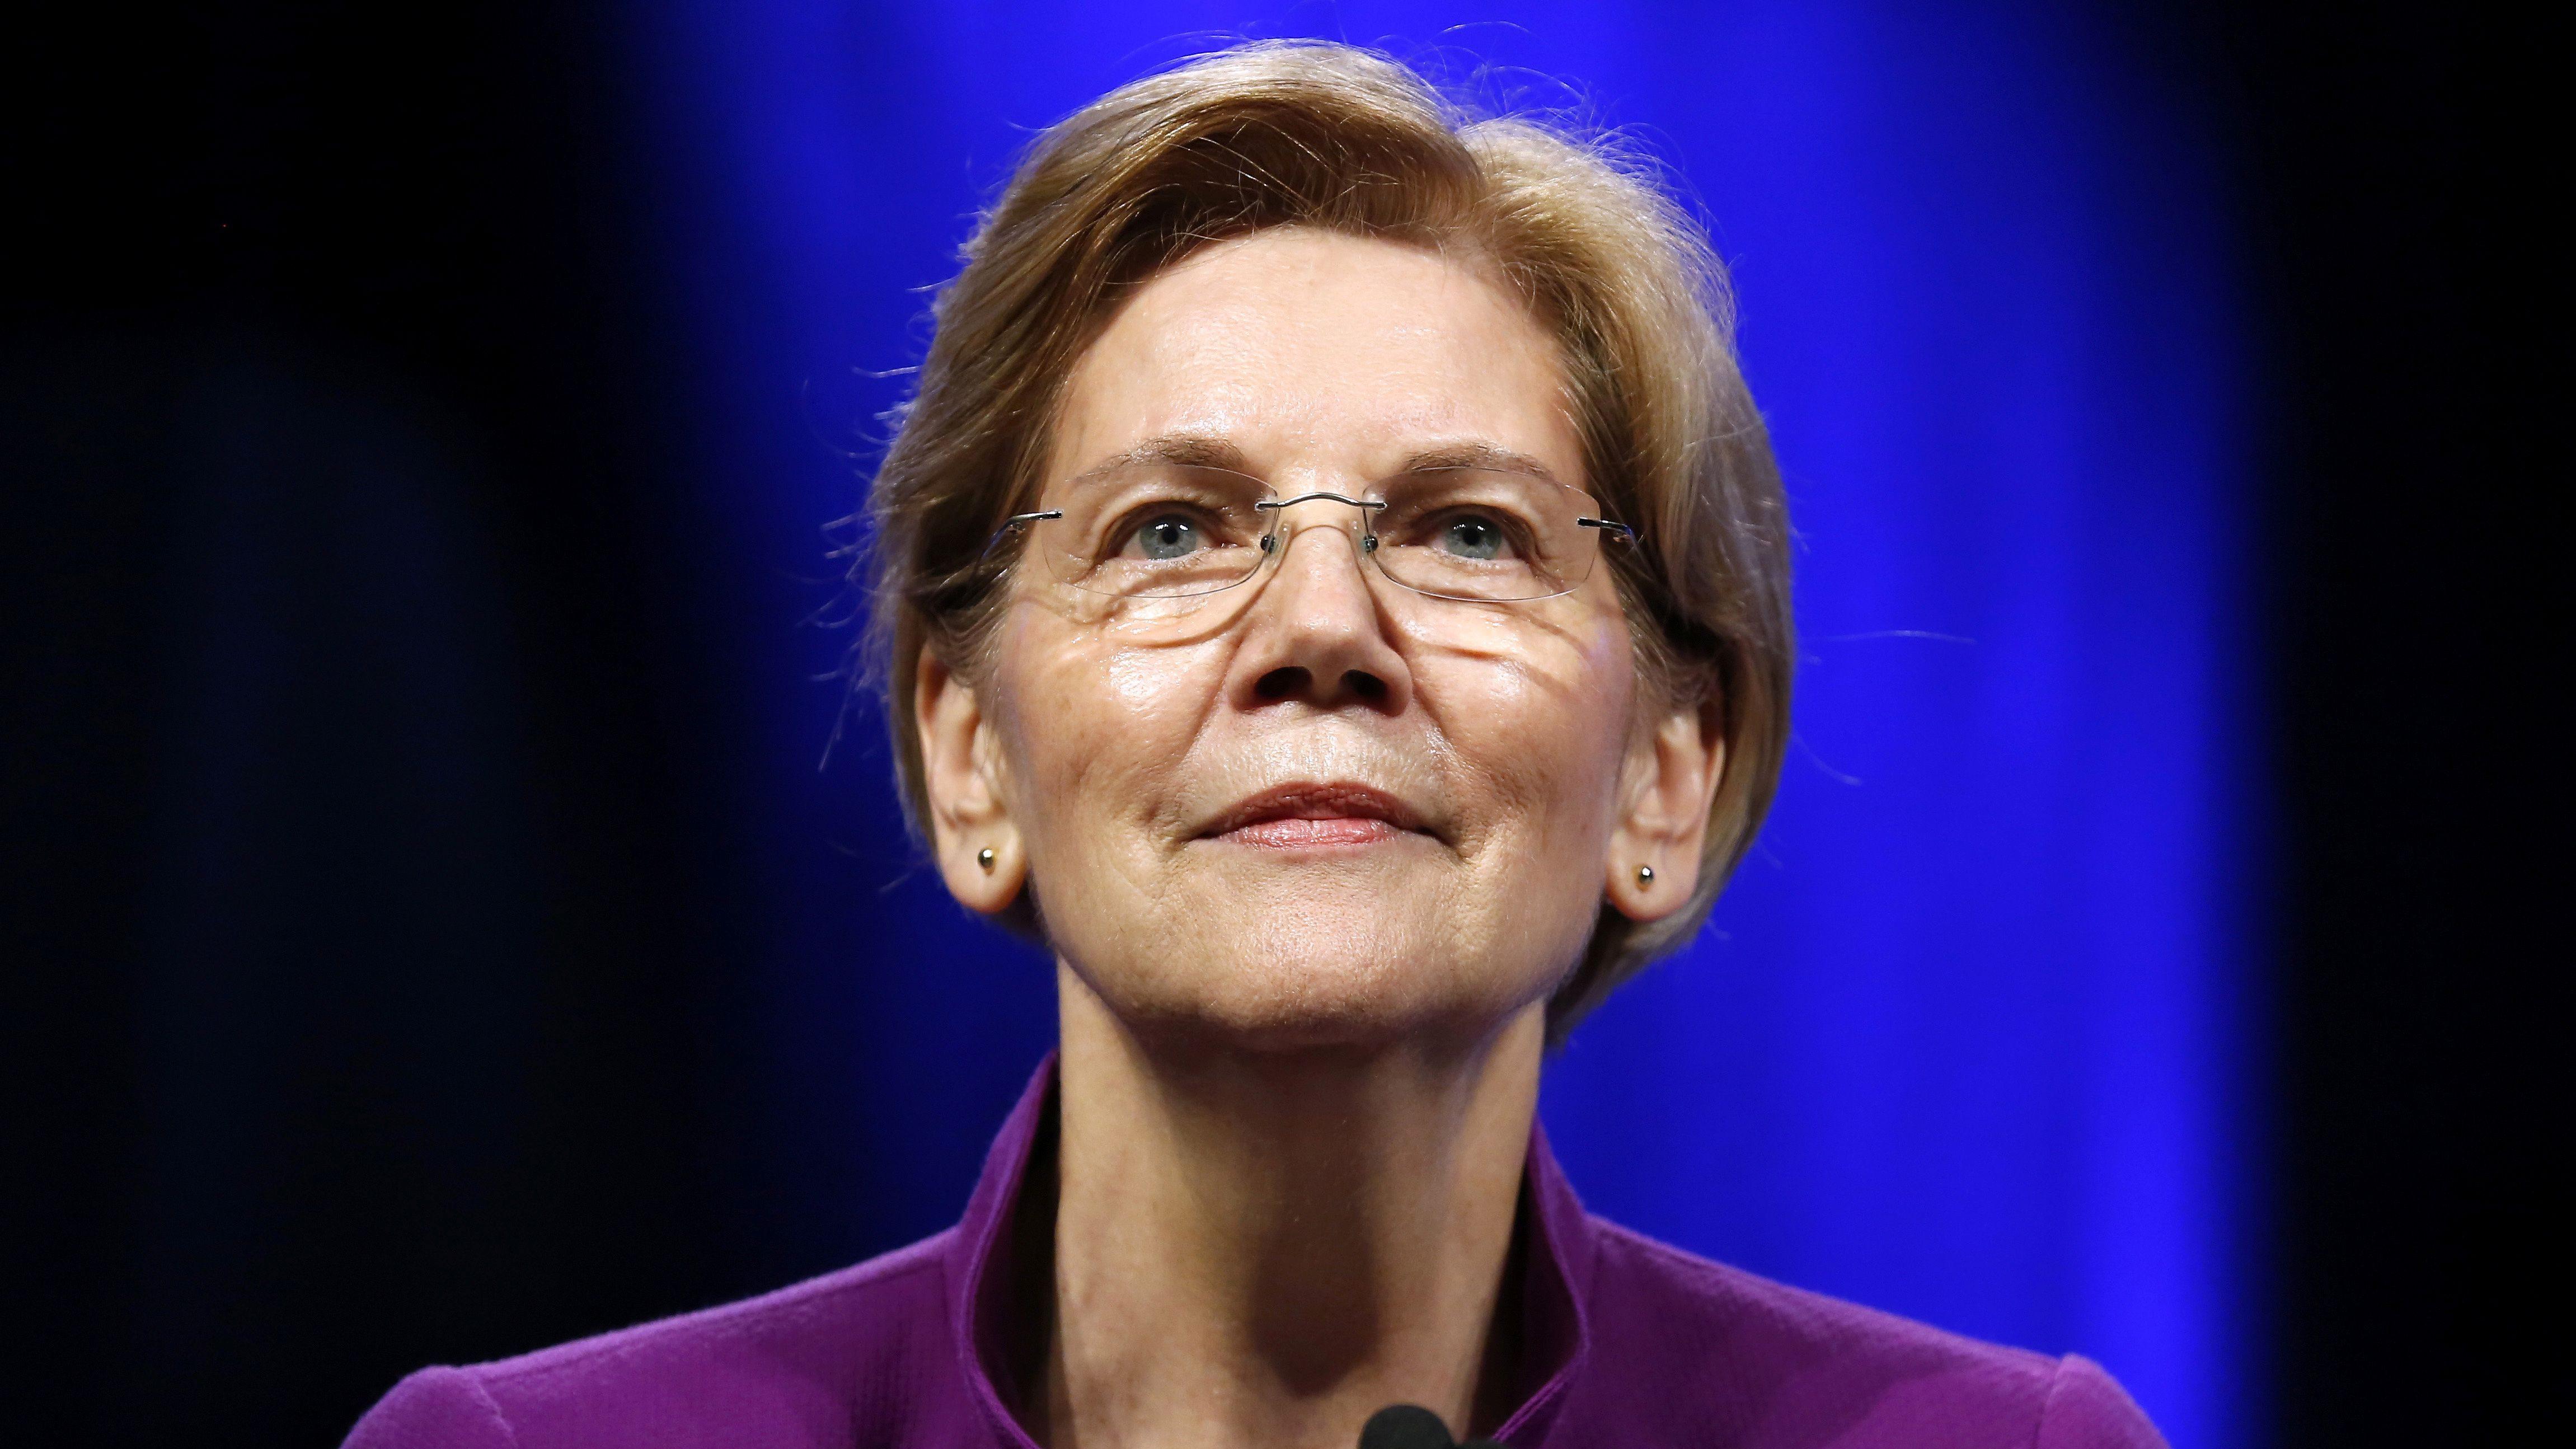 Elizabeth warren   dna results suggest she has native american ancestry quartz also rh qz